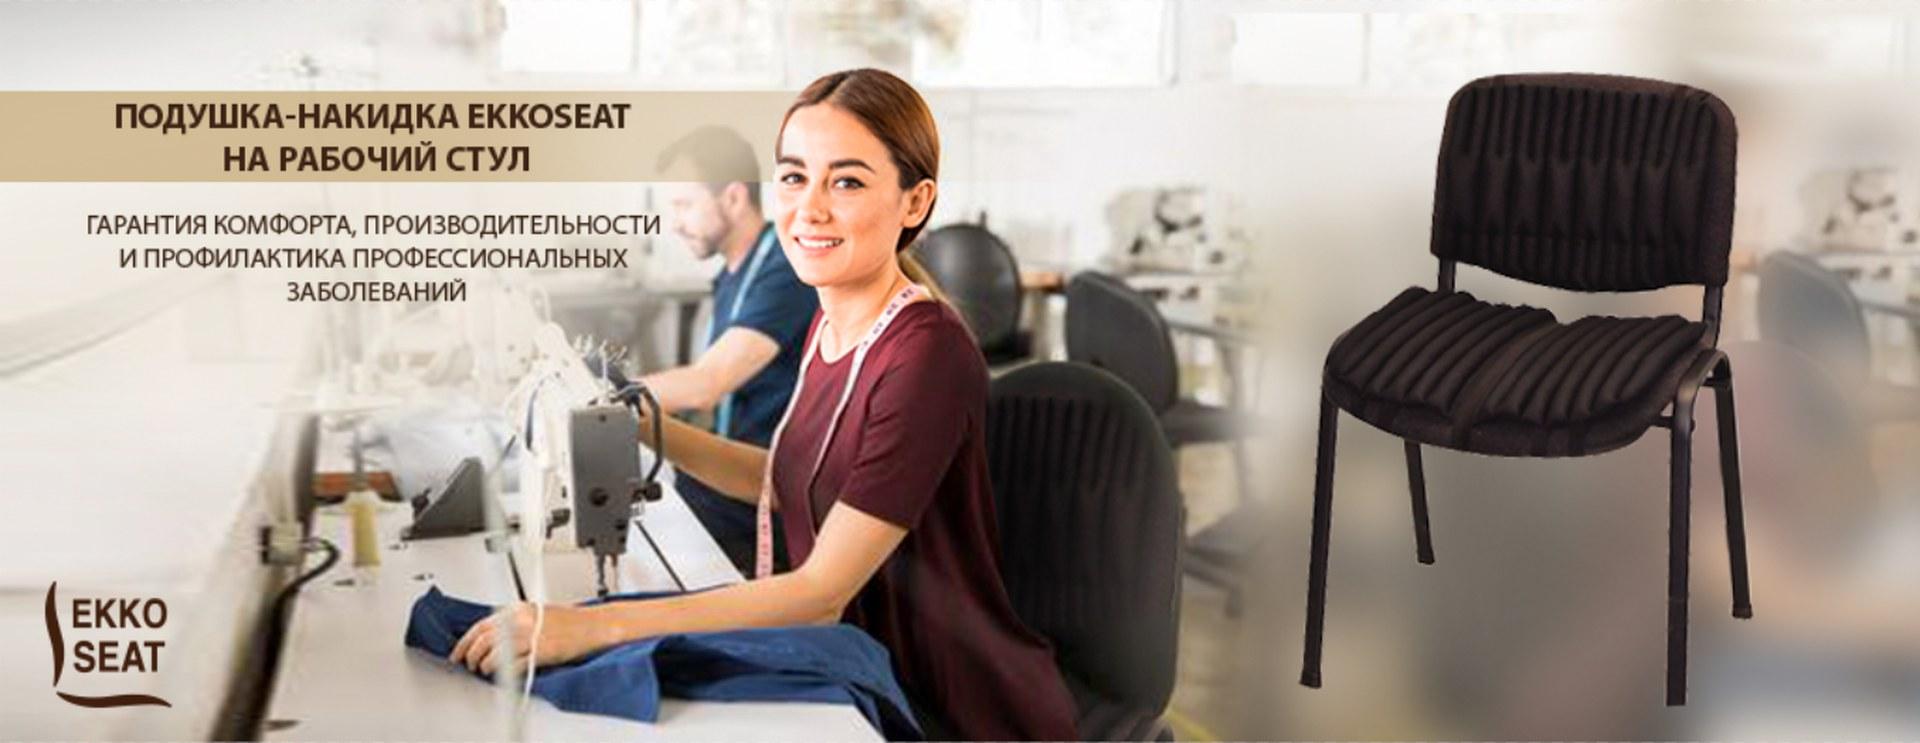 подушка на рабочее кресло